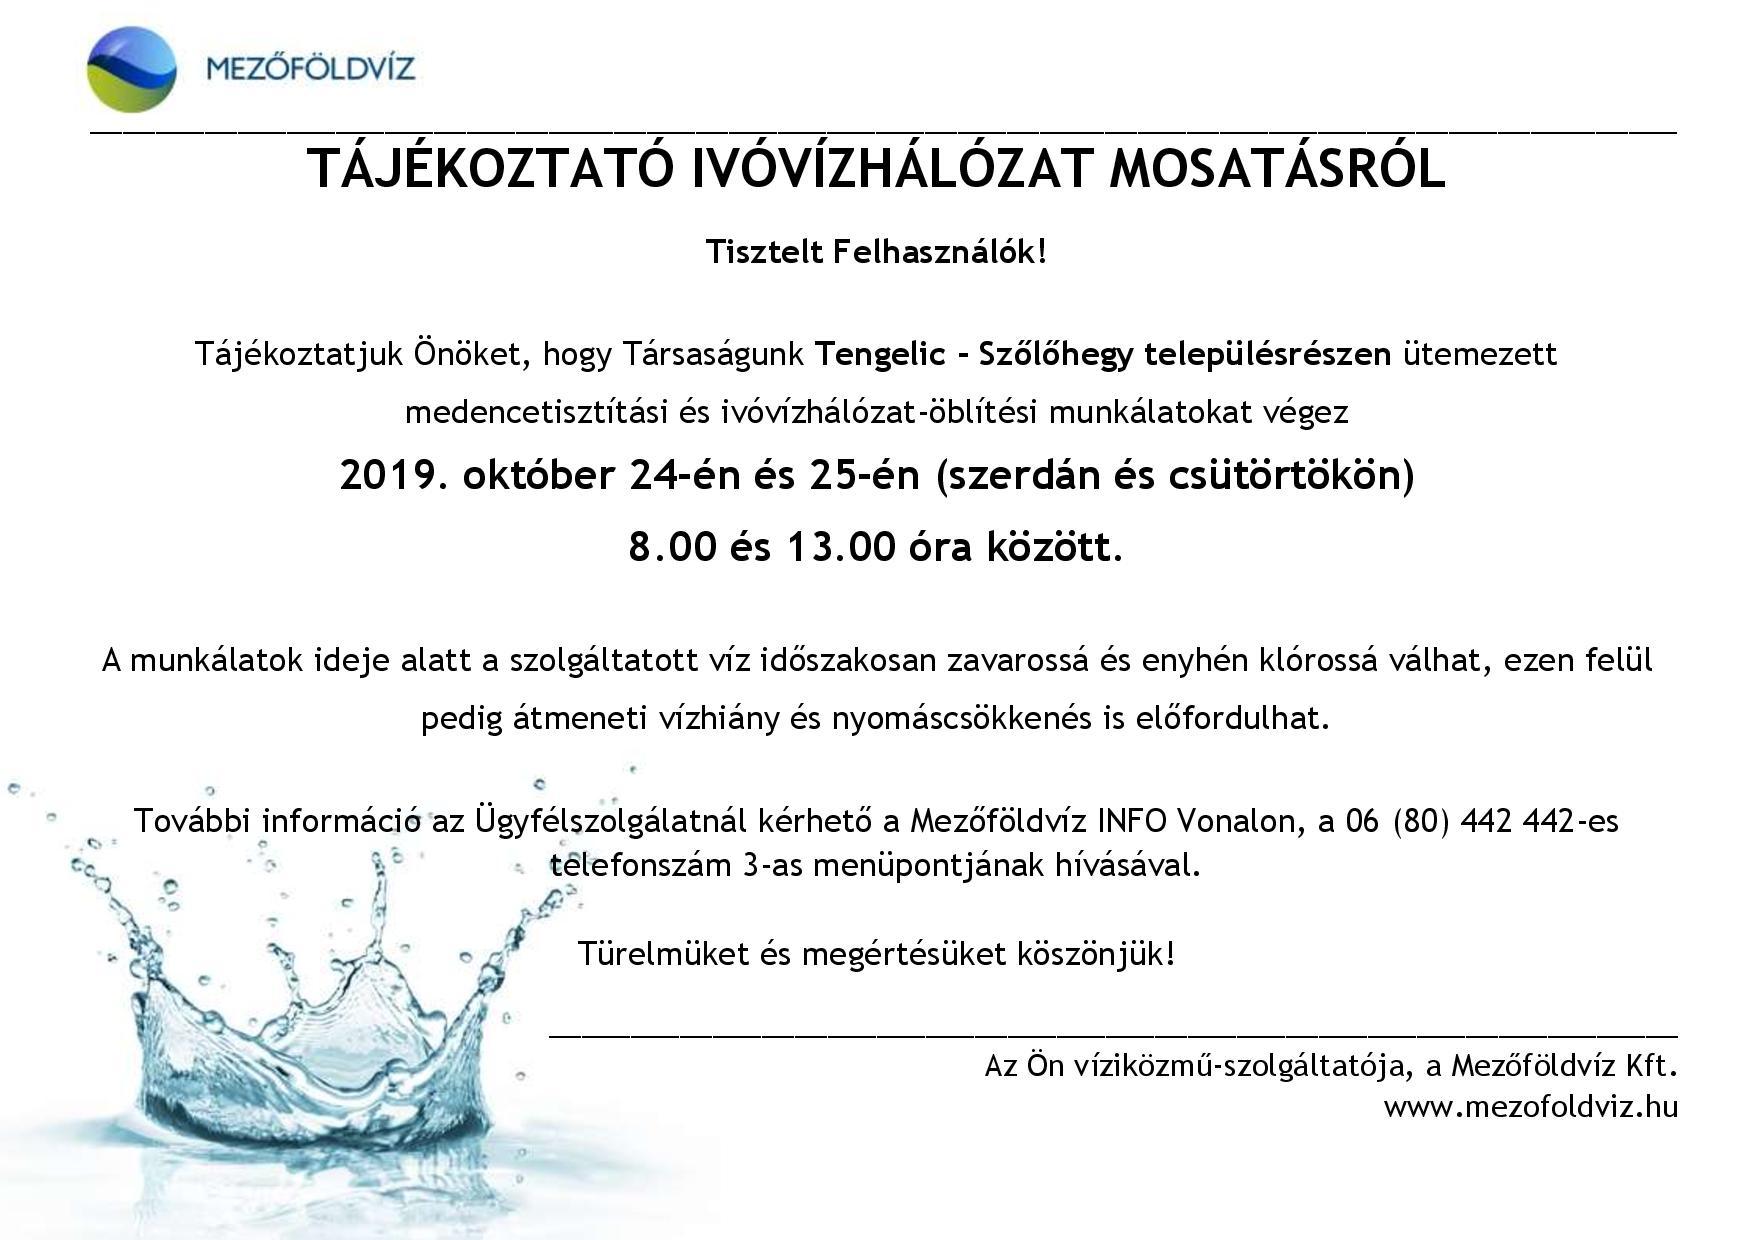 Tajekoztato-atmeneti-vizhianyrol-Tengelic-Szolohegyen-page-001